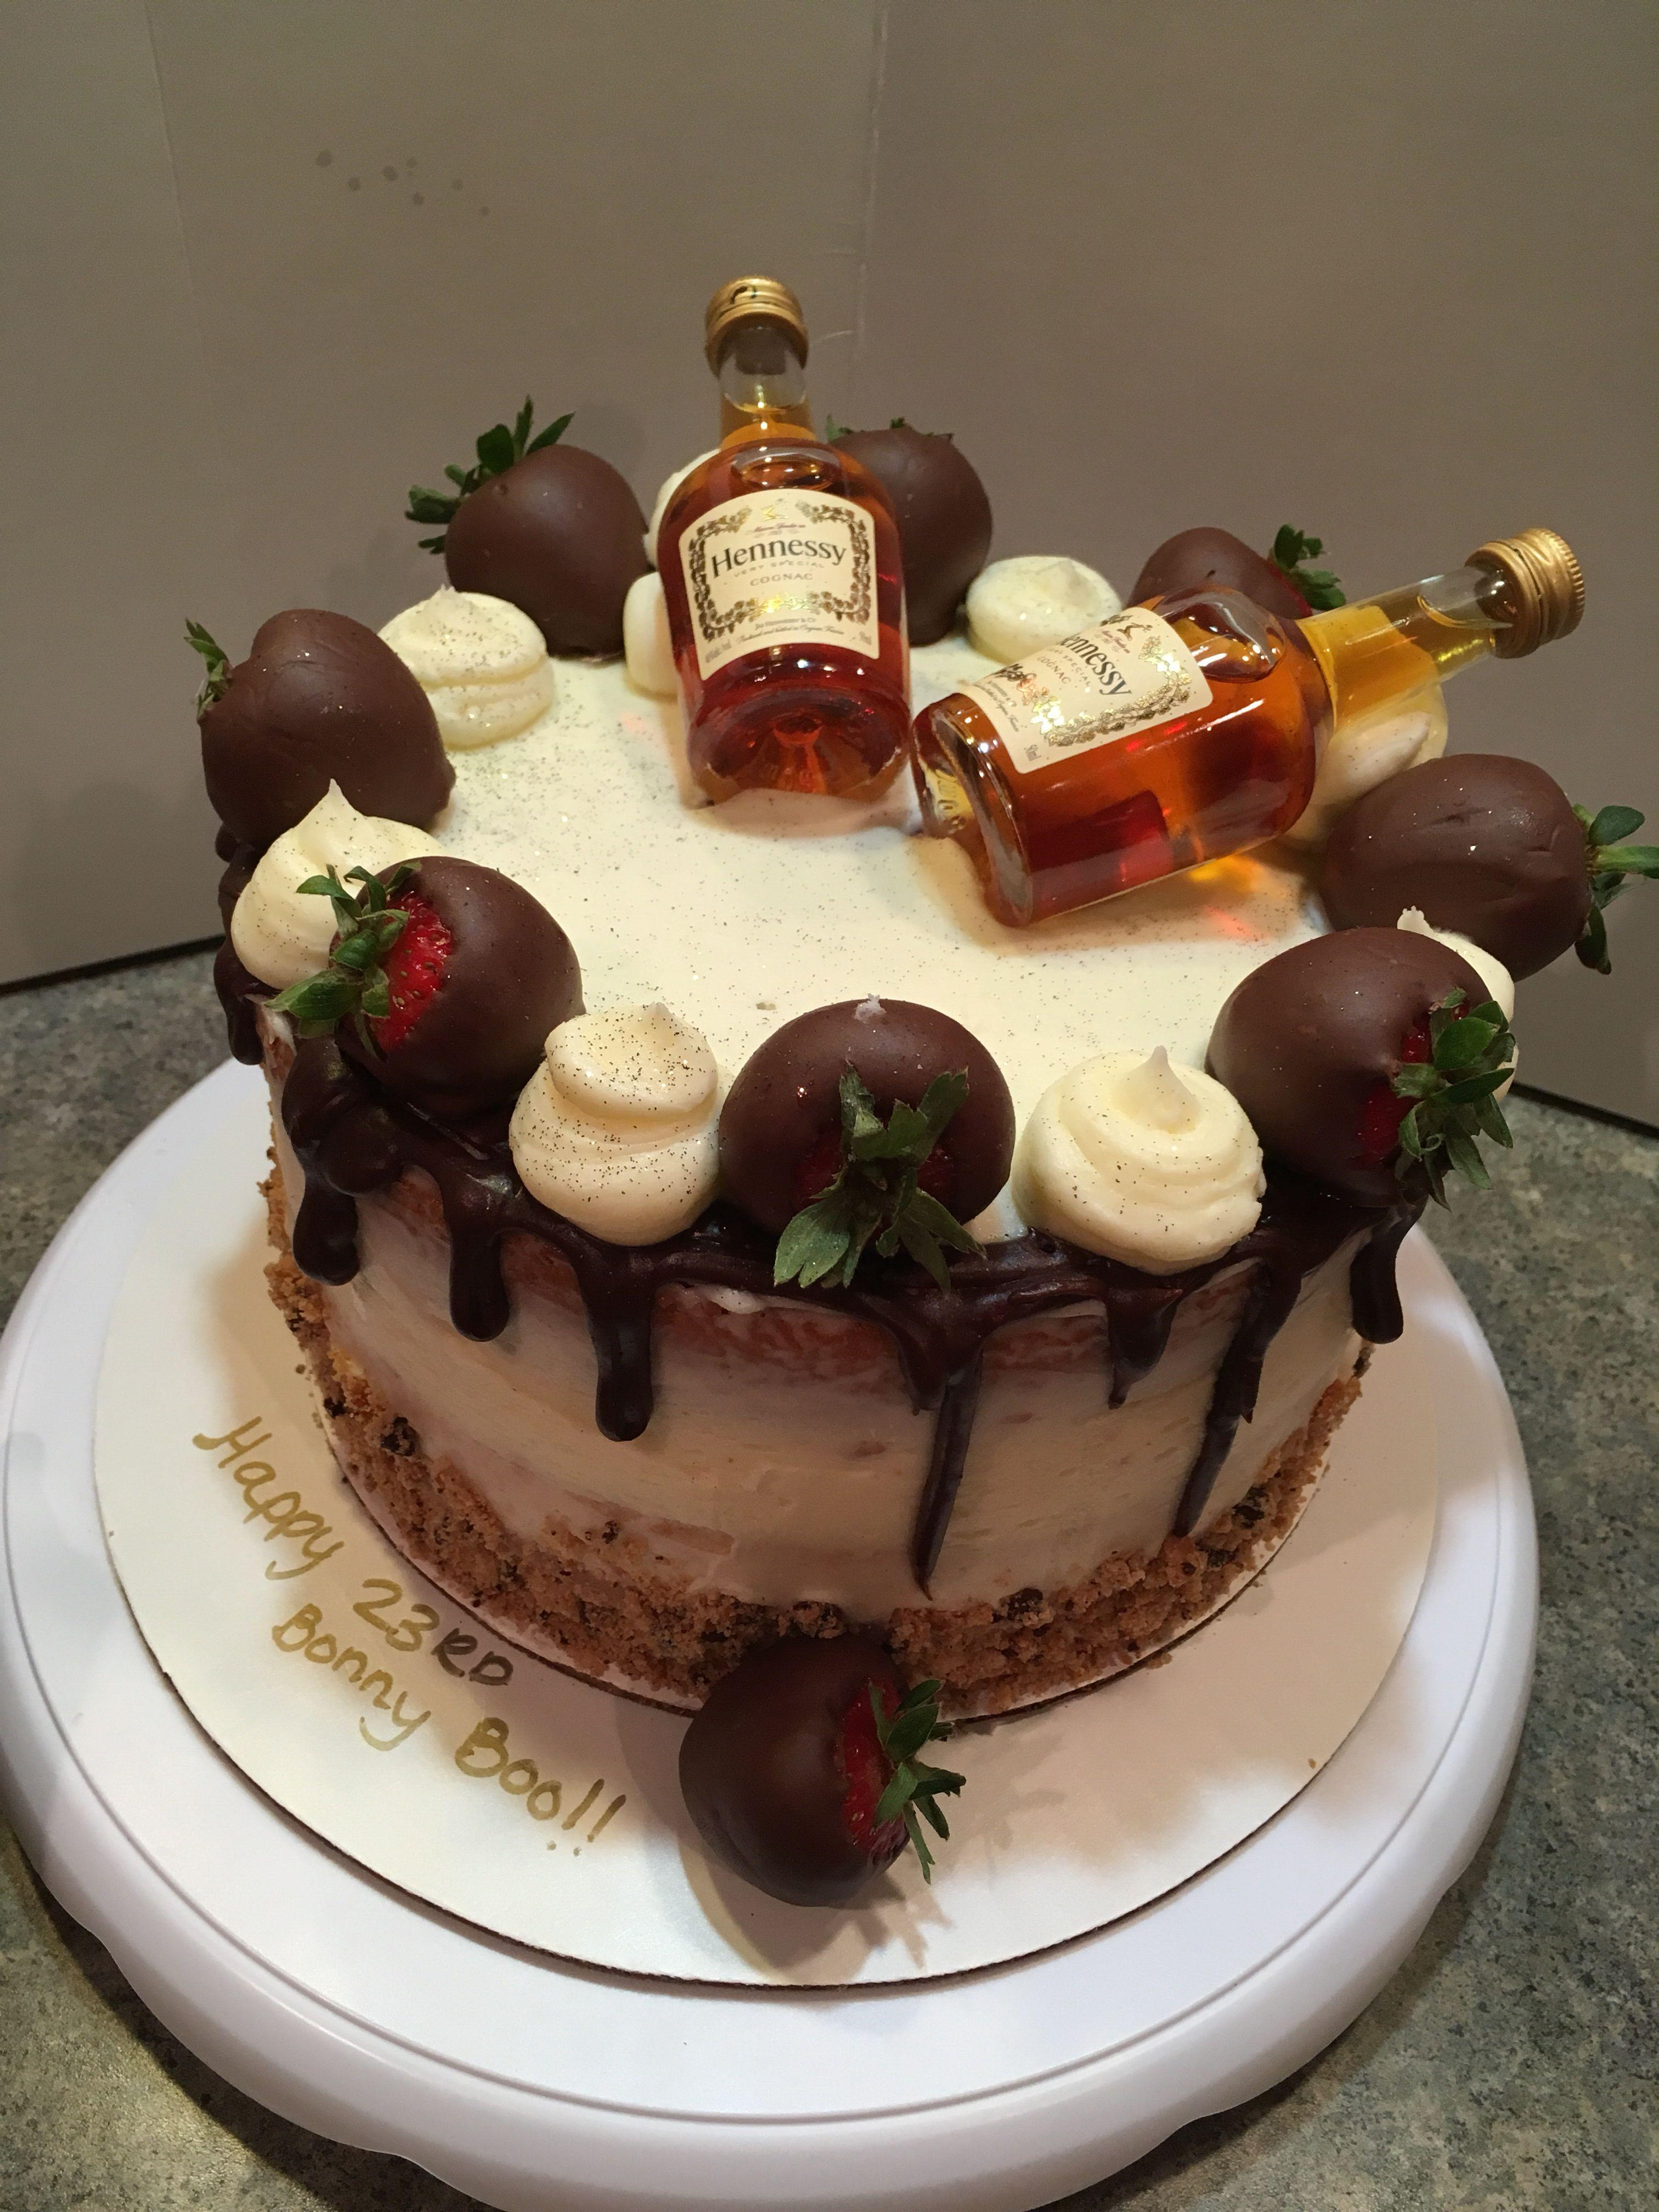 Hennessy Cake Booze Cake Liquor Cake Cake